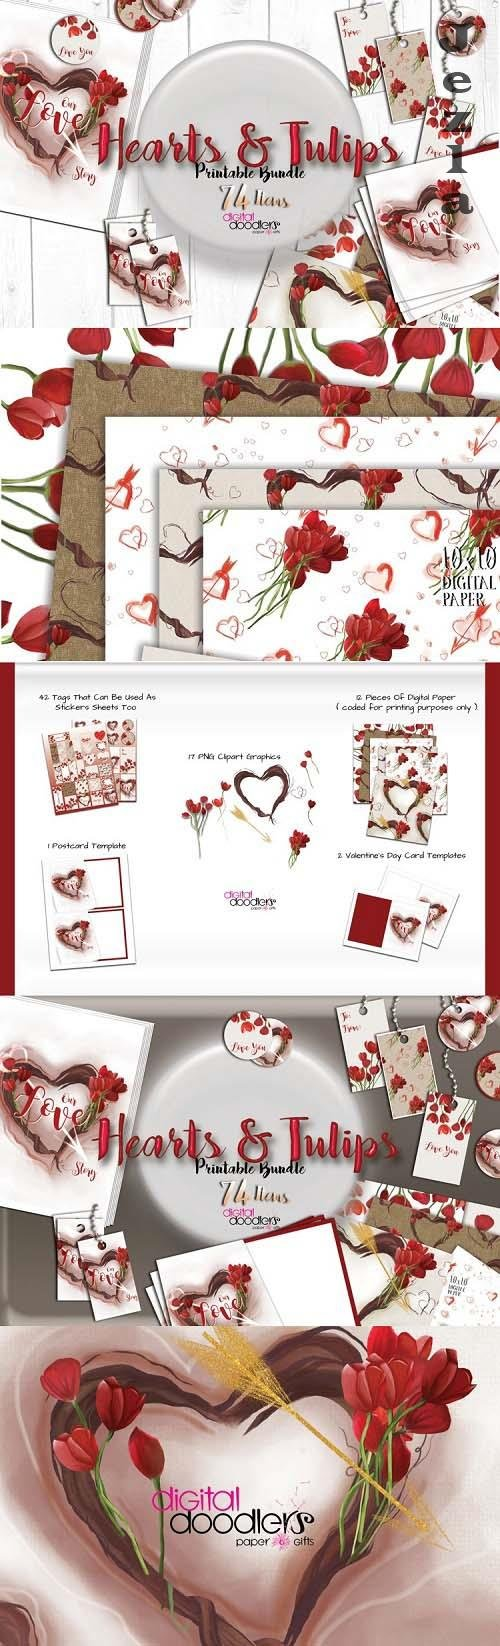 Hand Painted Hearts & Tulips Bundle - 54020 - Cupid Hearts Watercolor Bundle